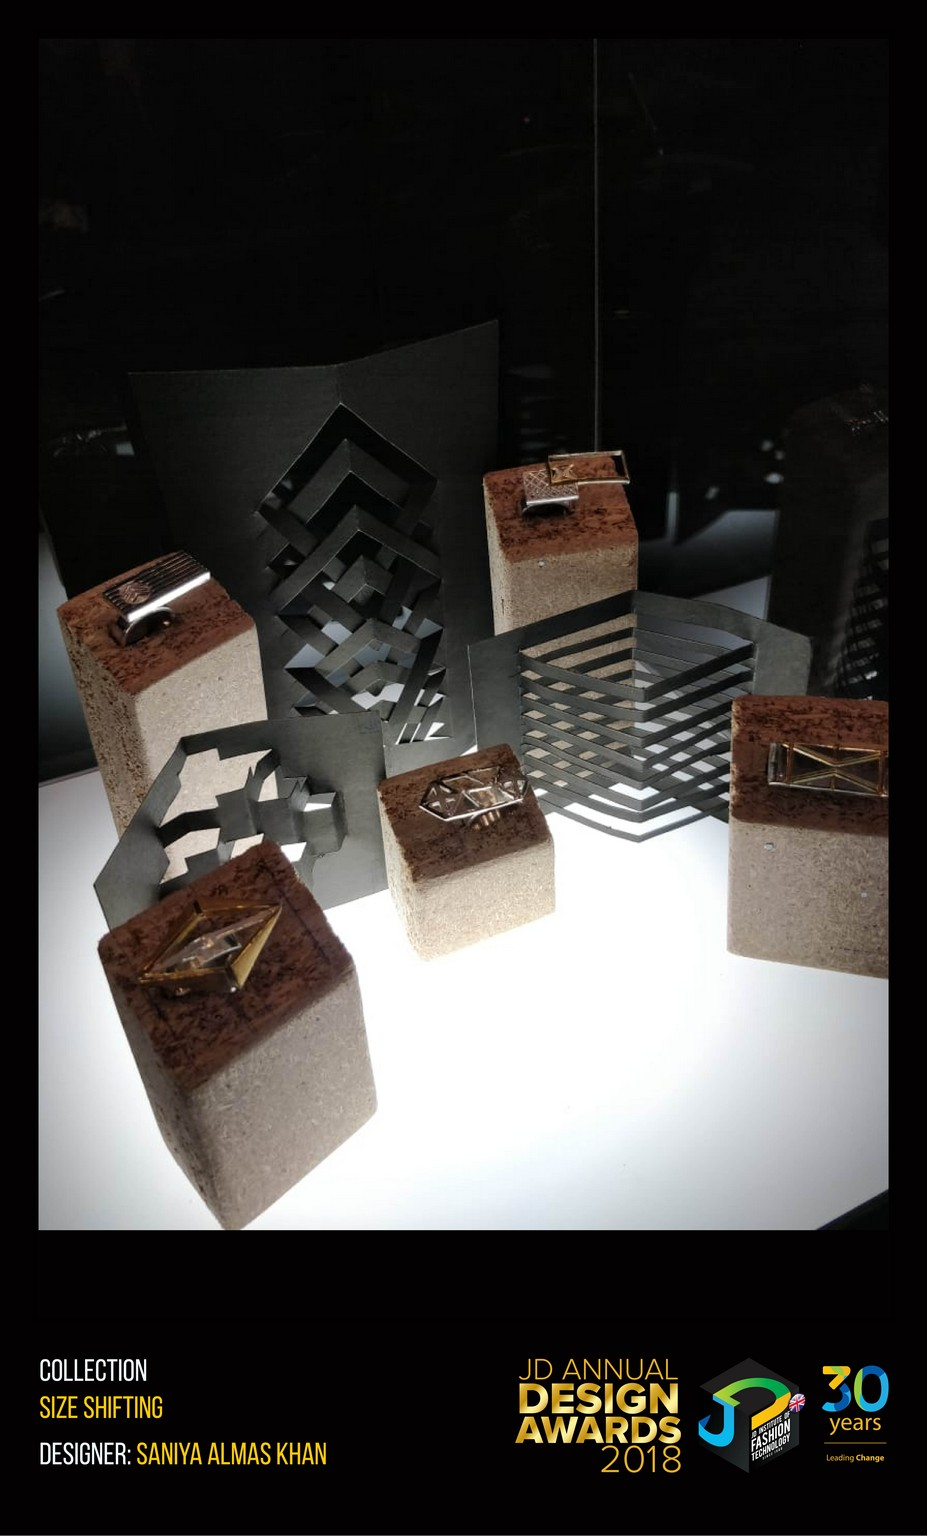 Size Shifting – Change – JD Annual Design Awards 2018 | Designer: Saniya Almas Khan | Photography : Jerin Nath (@jerin_nath) size shifting Size Shifting – Change – JD Annual Design Awards 2018 Size Shifting